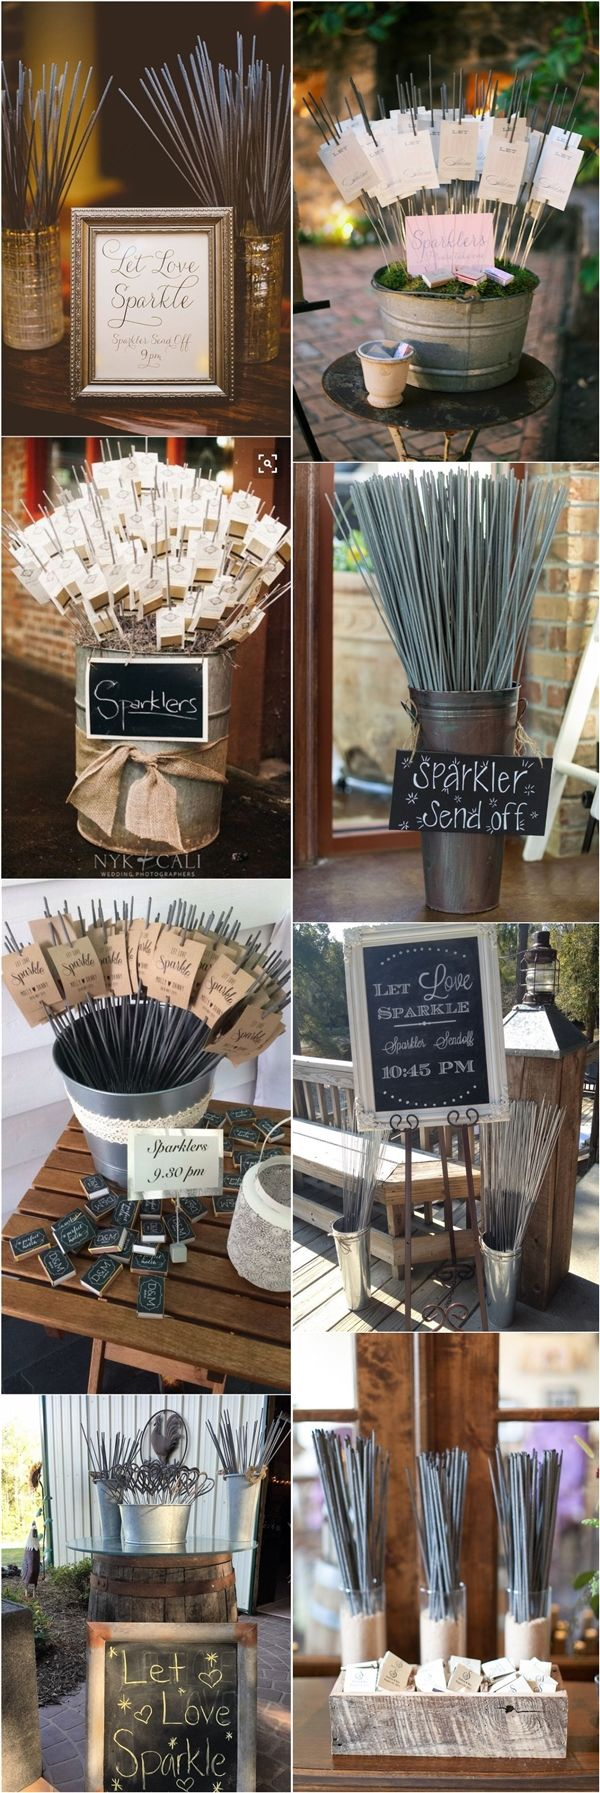 Top 20 Wedding Sparkler Send Off Ideas